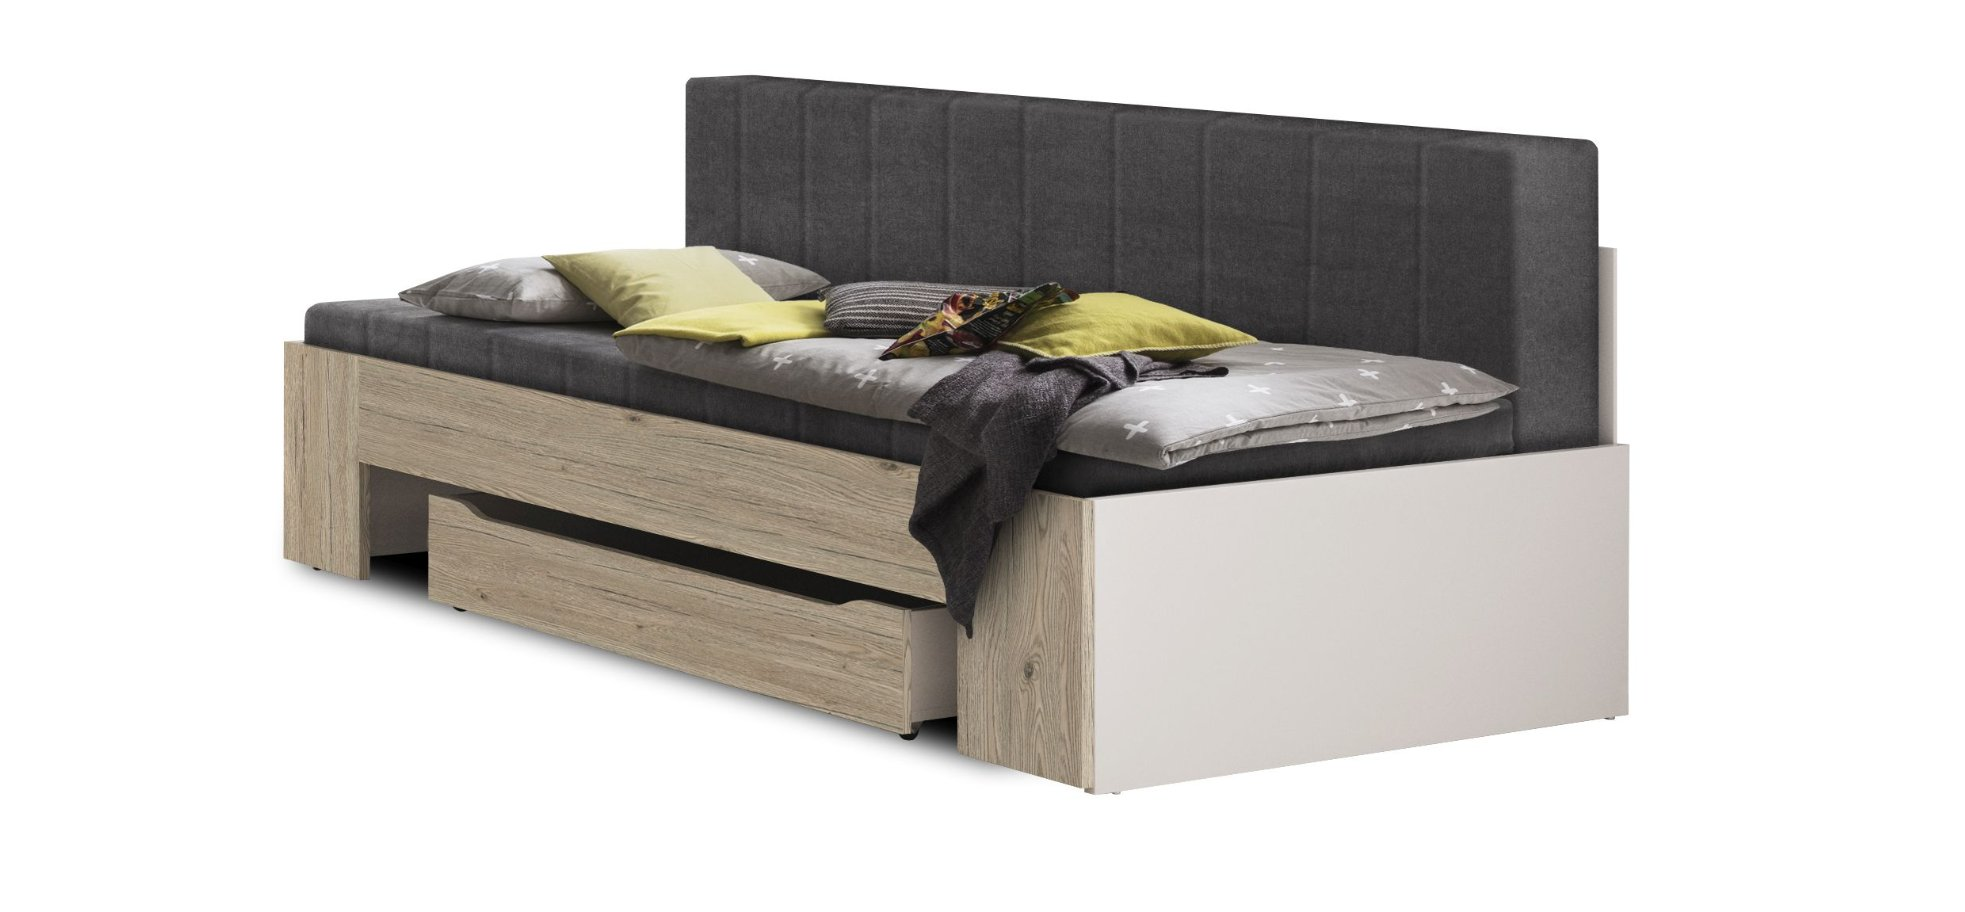 Full Size of Ausziehbares Doppelbett Ikea Ausziehbare Doppelbettcouch Sortiment Mbel Hesse Bett Wohnzimmer Ausziehbares Doppelbett